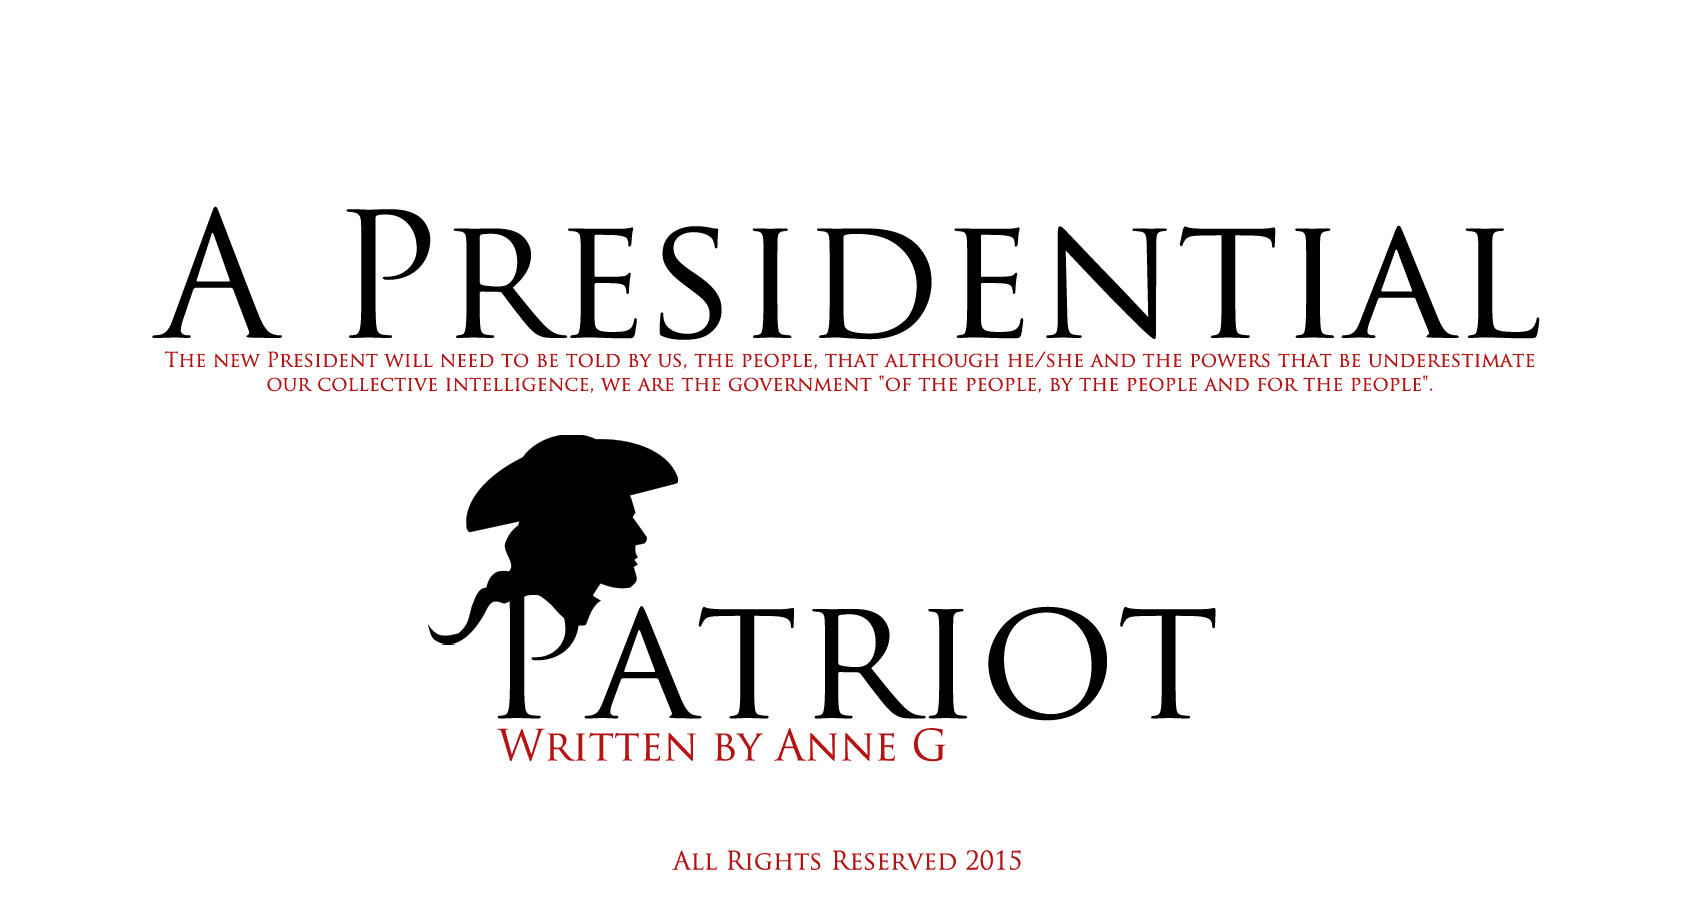 spillwords.com A presidential Patriot by Anne G